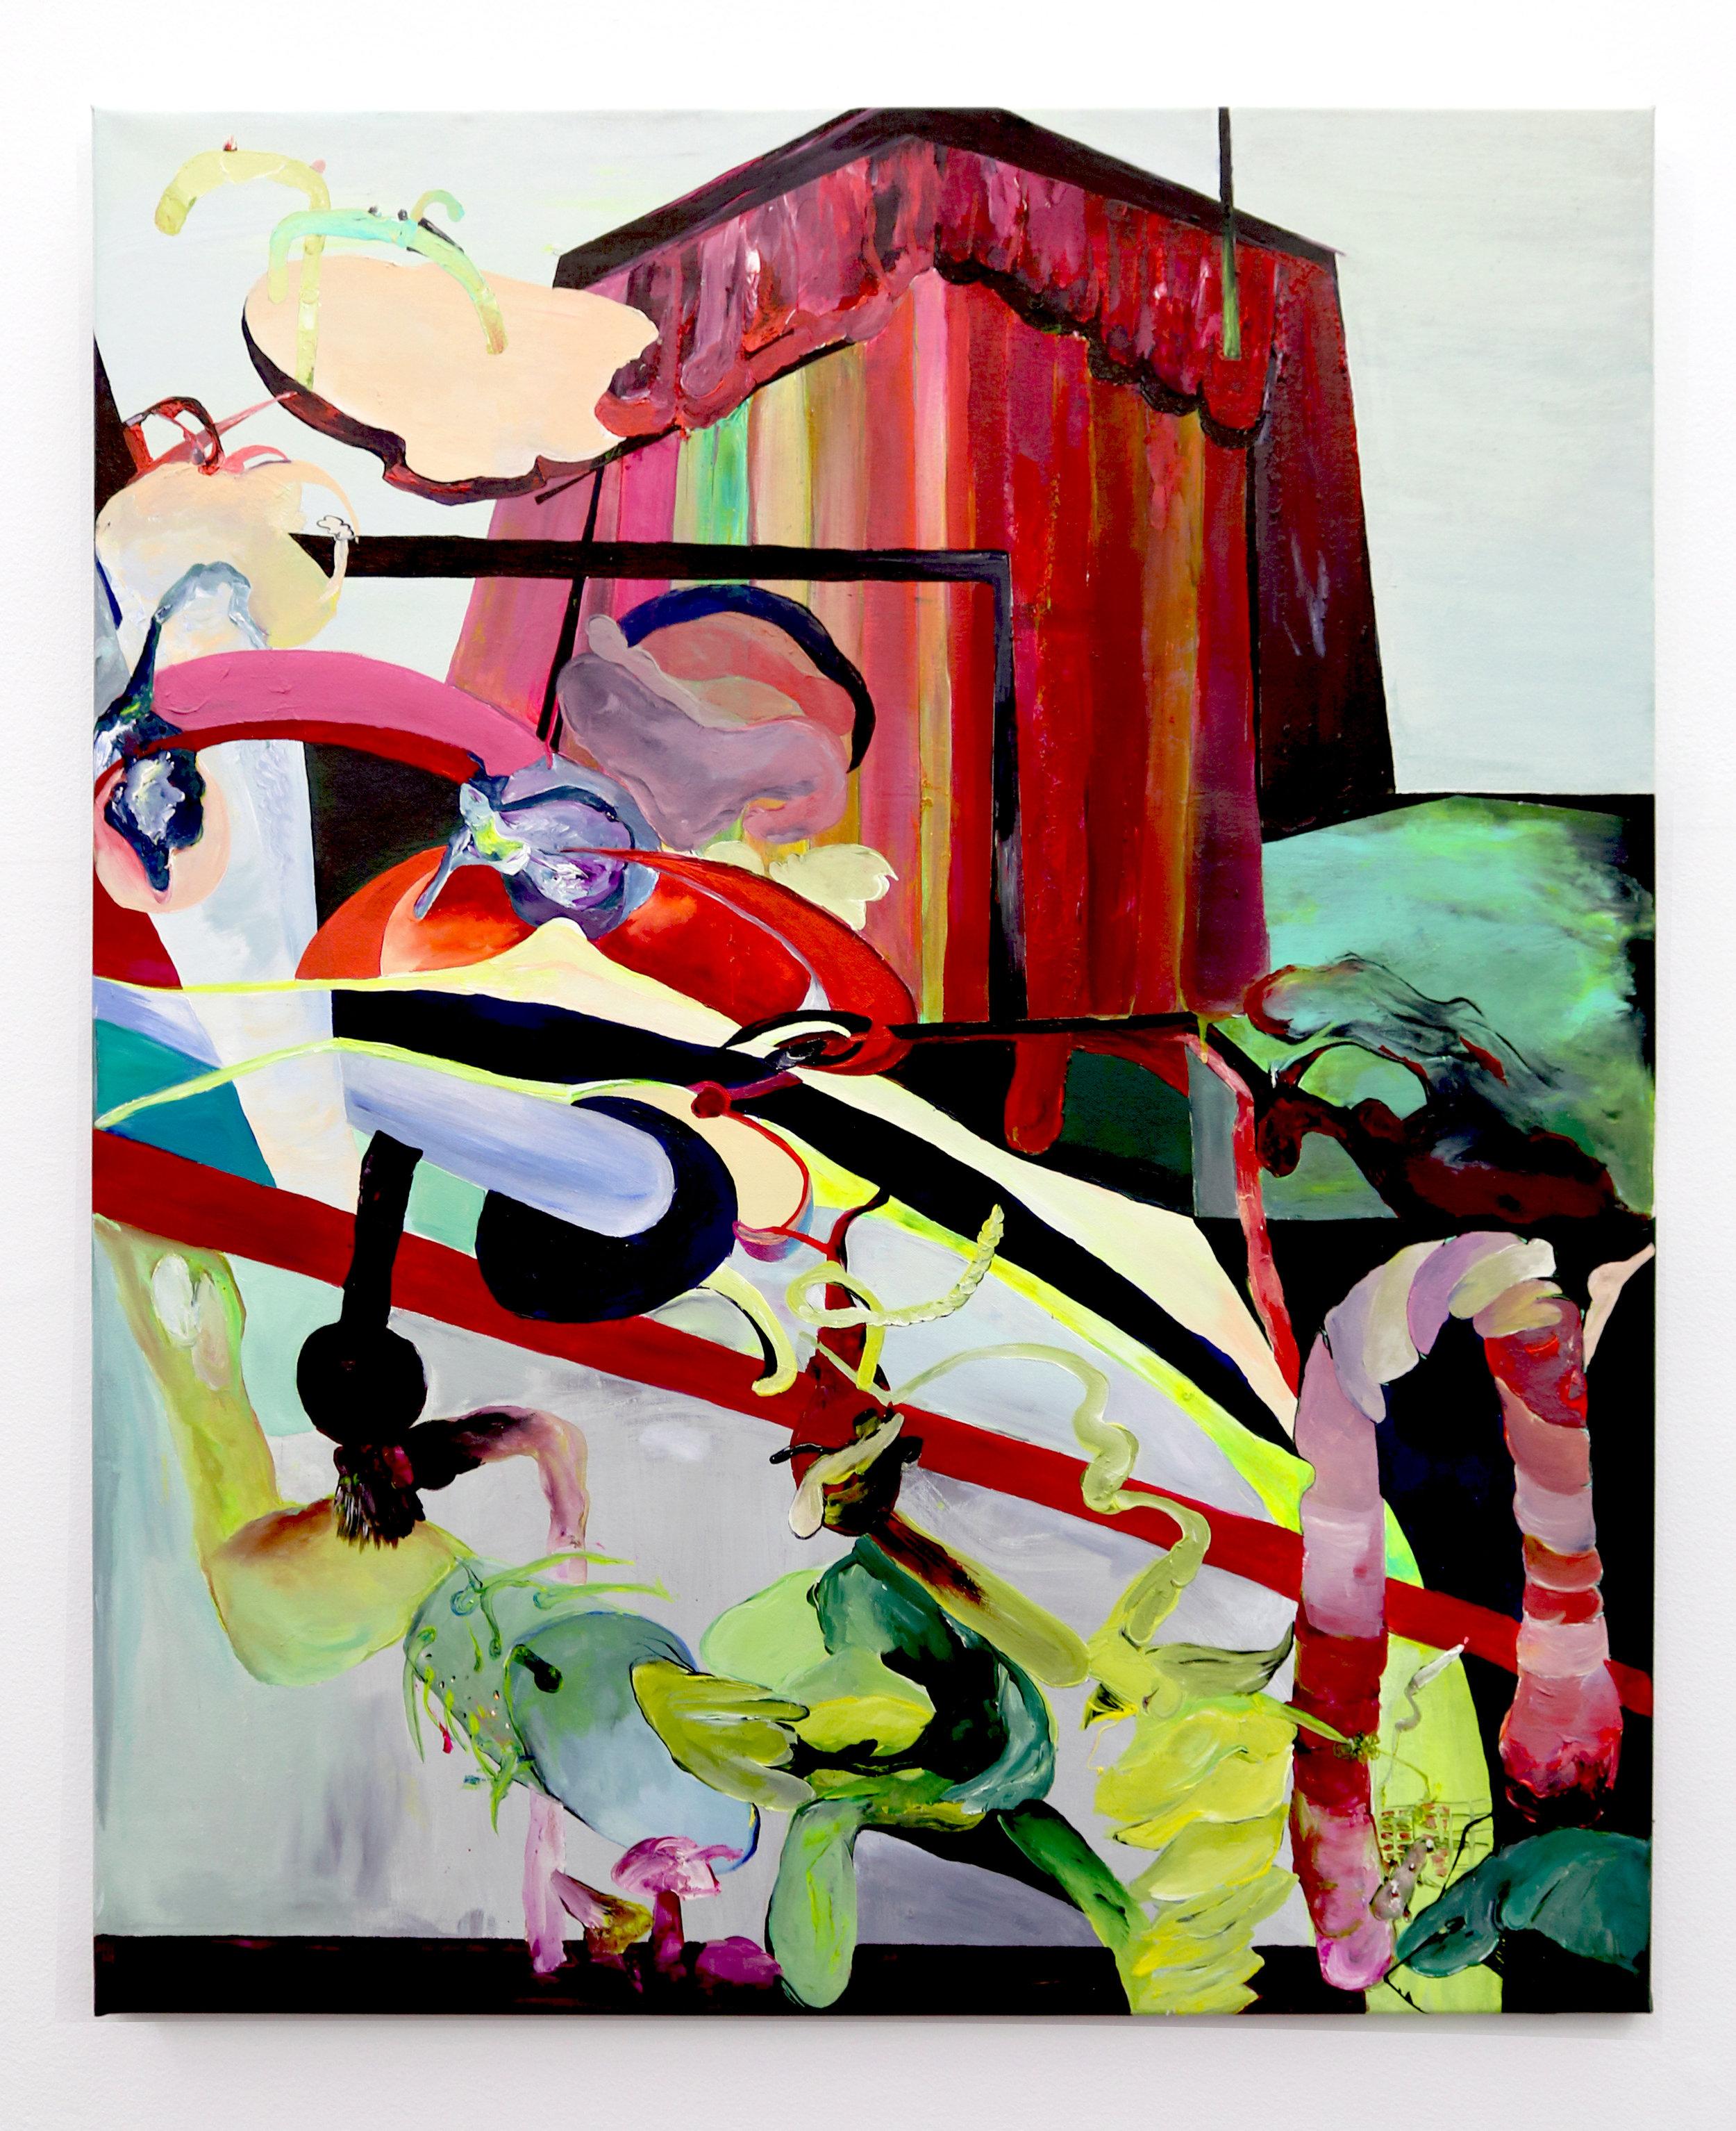 'Untitled', acrylic on canvas, 120 x 100 cm, 2016